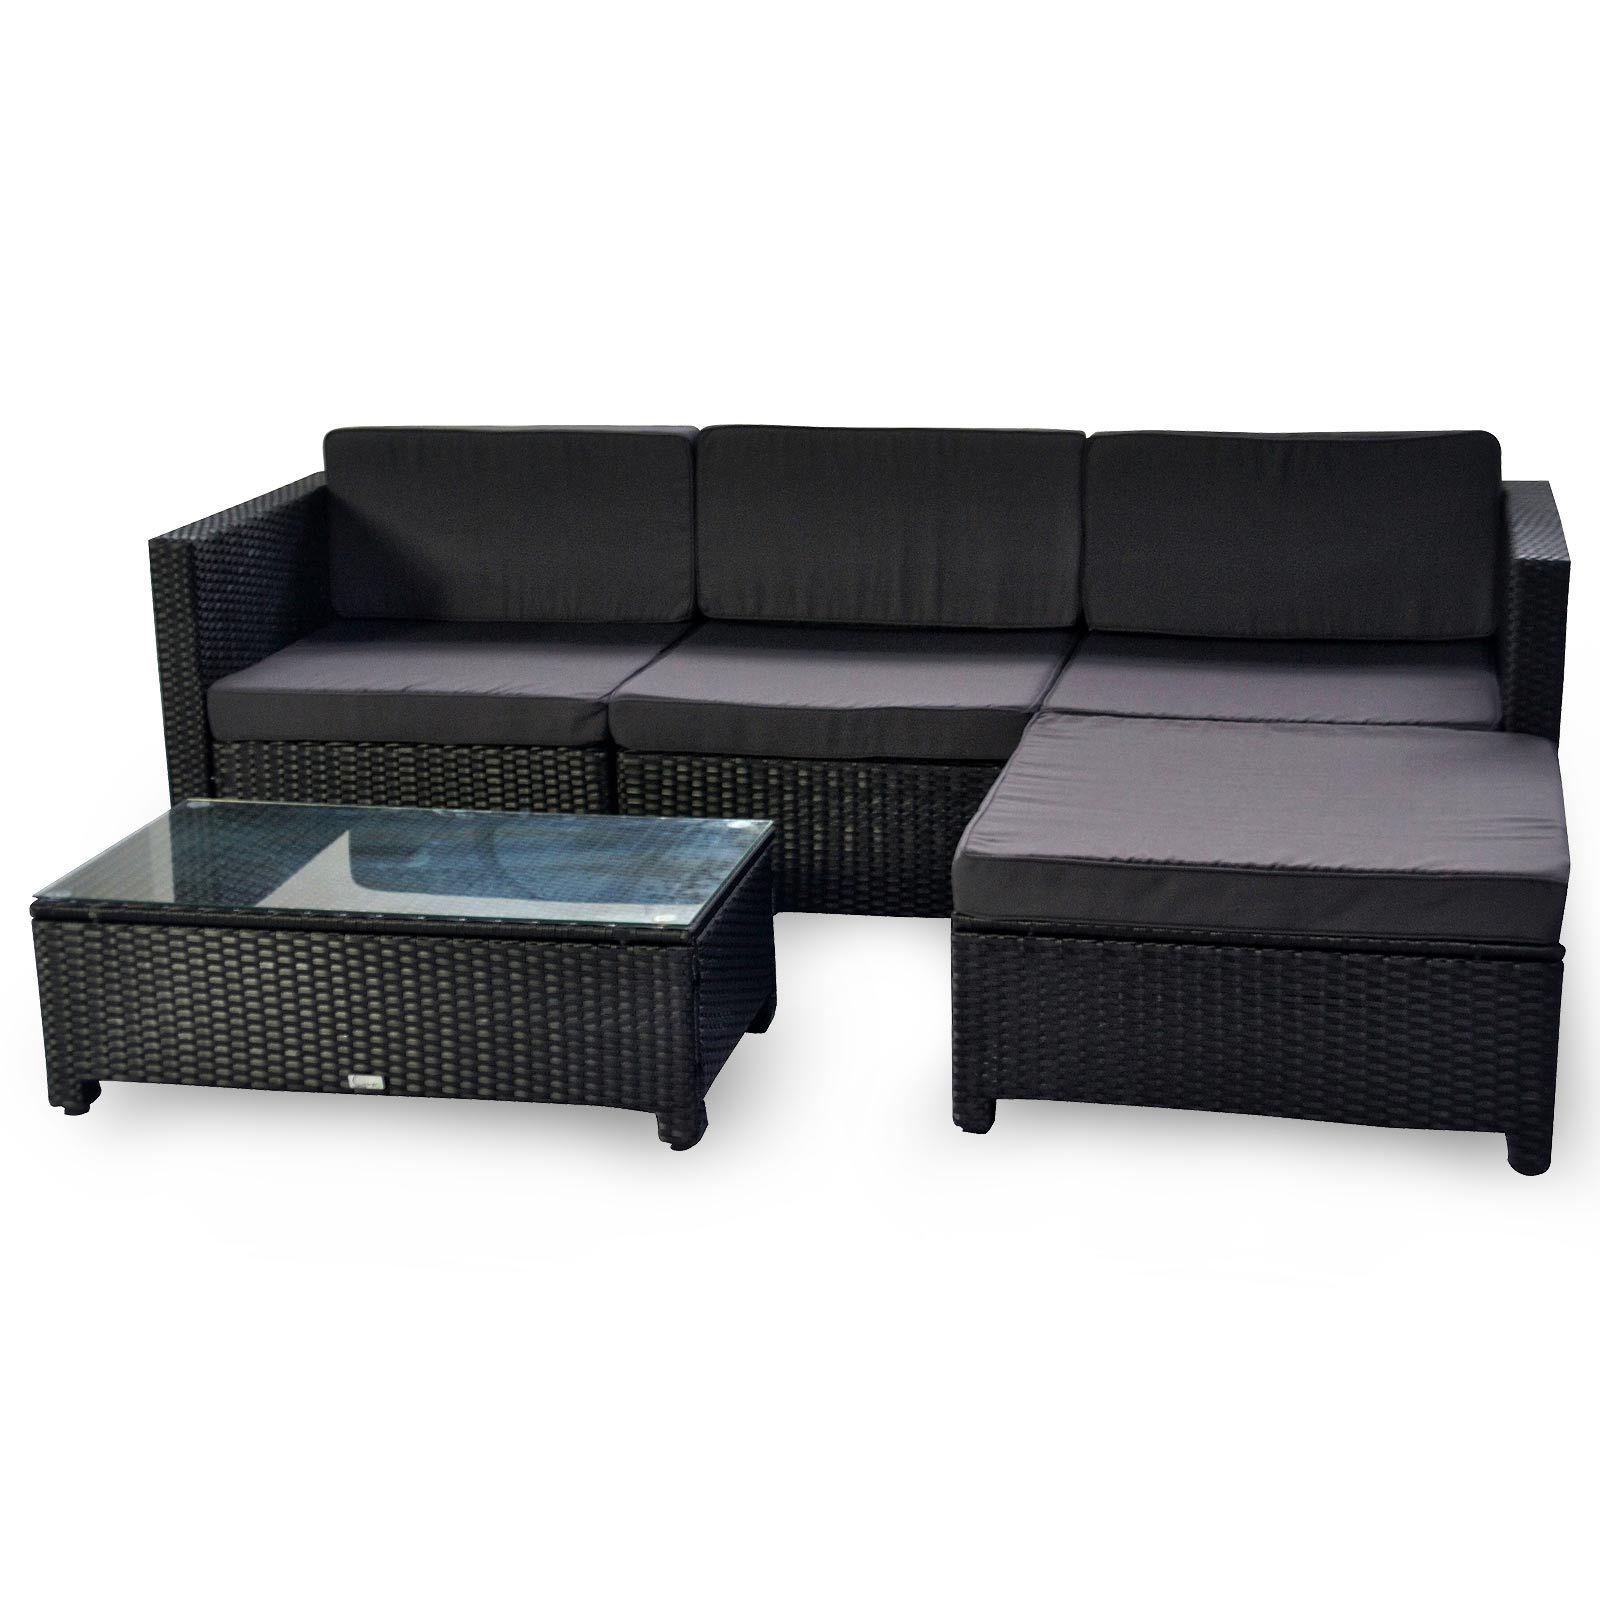 Luxo Milton Modular Outdoor Sofa Set - Charcoal | Outdoor ... on Luxo Living Outdoor id=46423